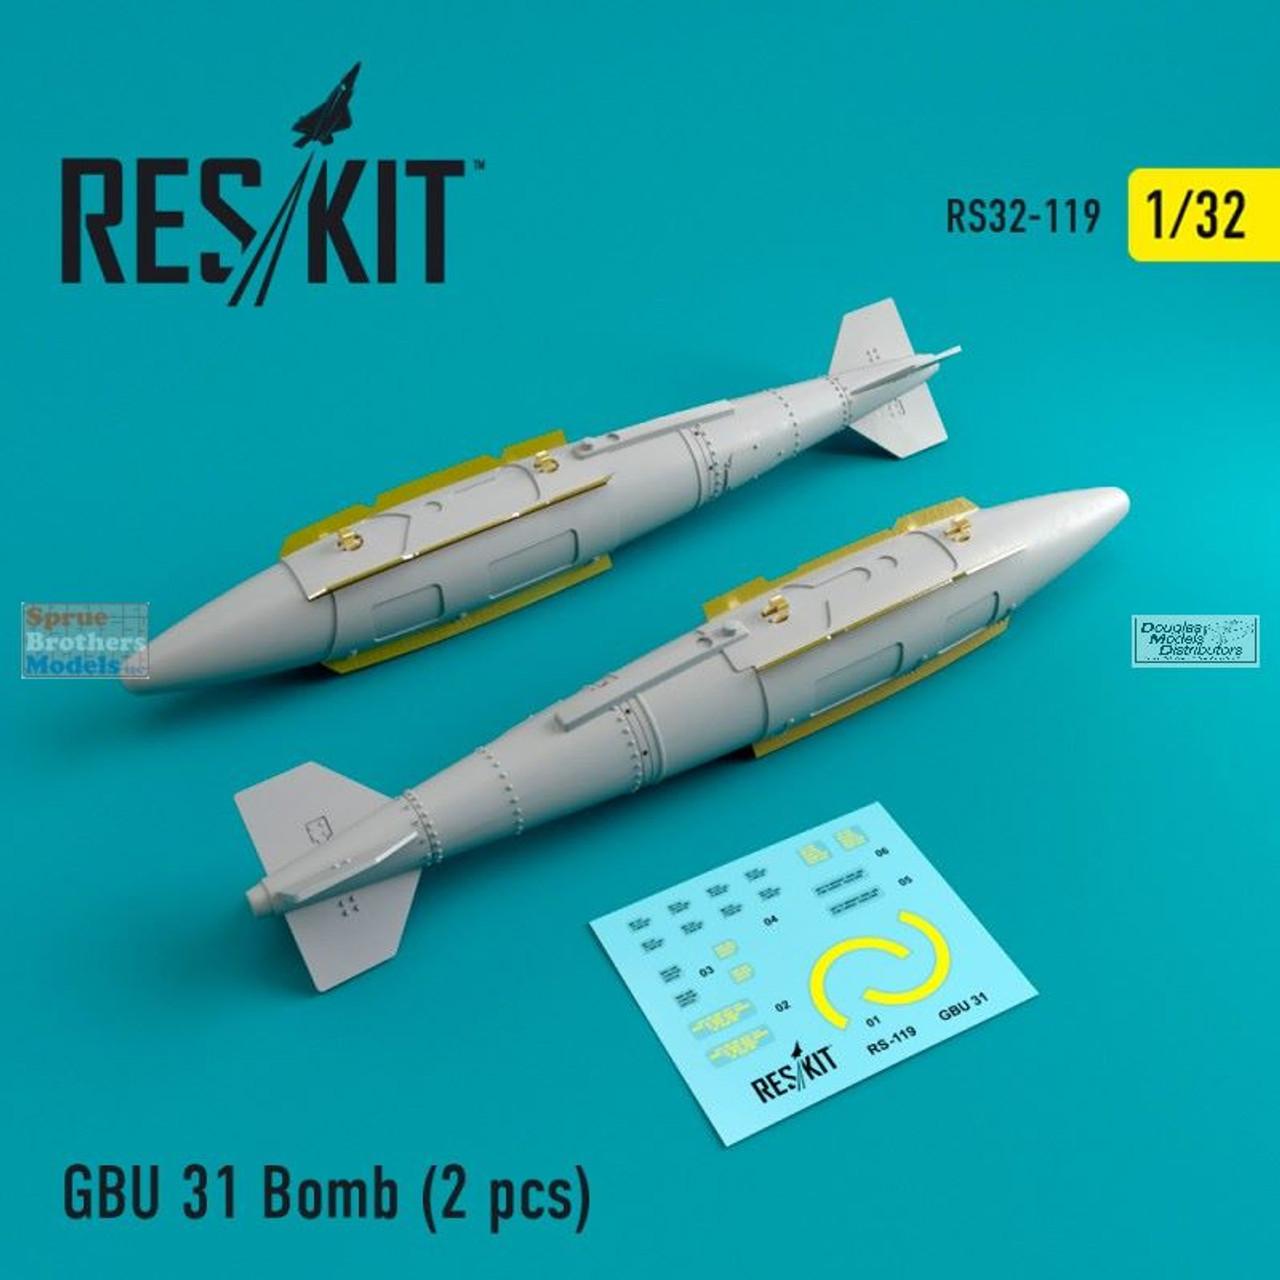 RESRS320119 1:32 ResKit GBU-31 Bomb Set